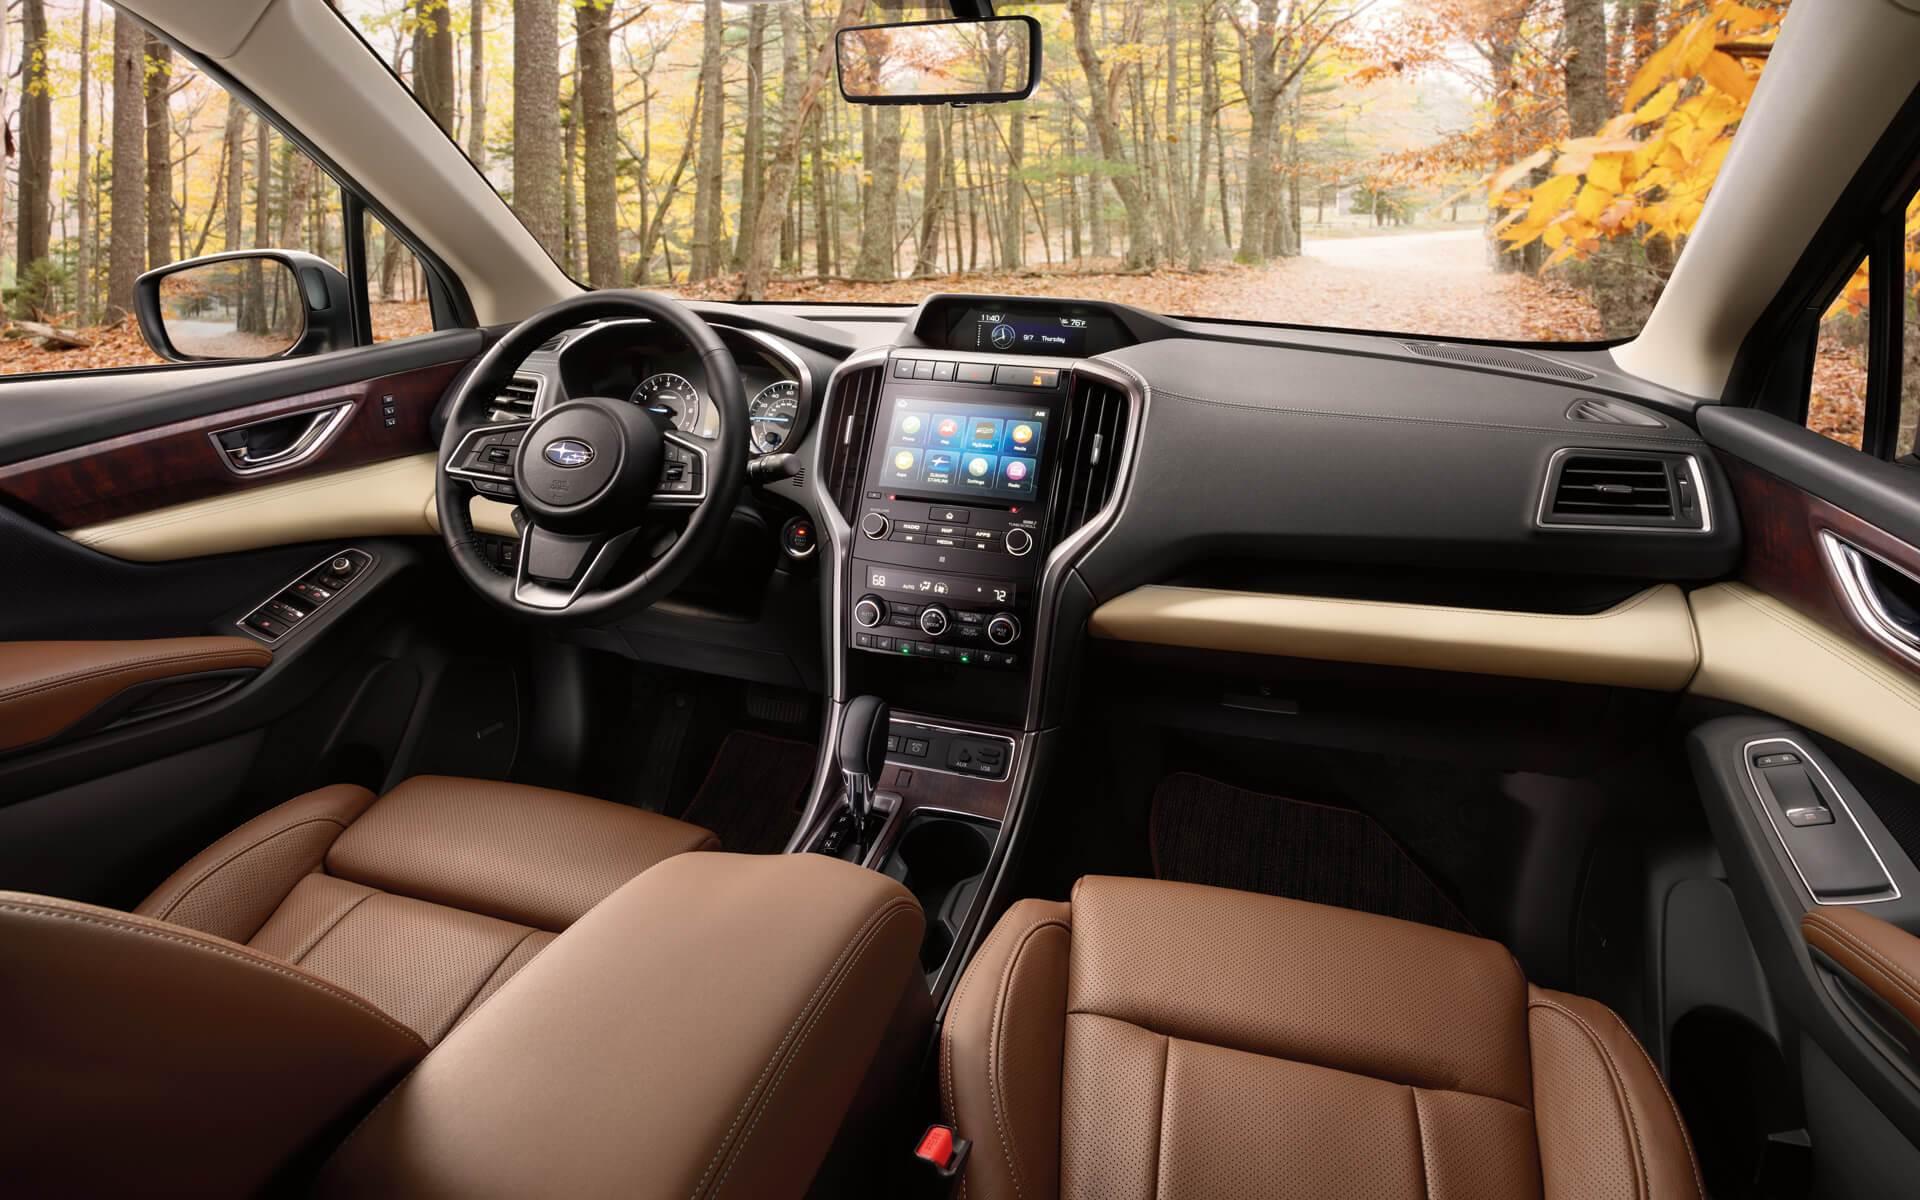 Interior of the 2019 Subaru Ascent